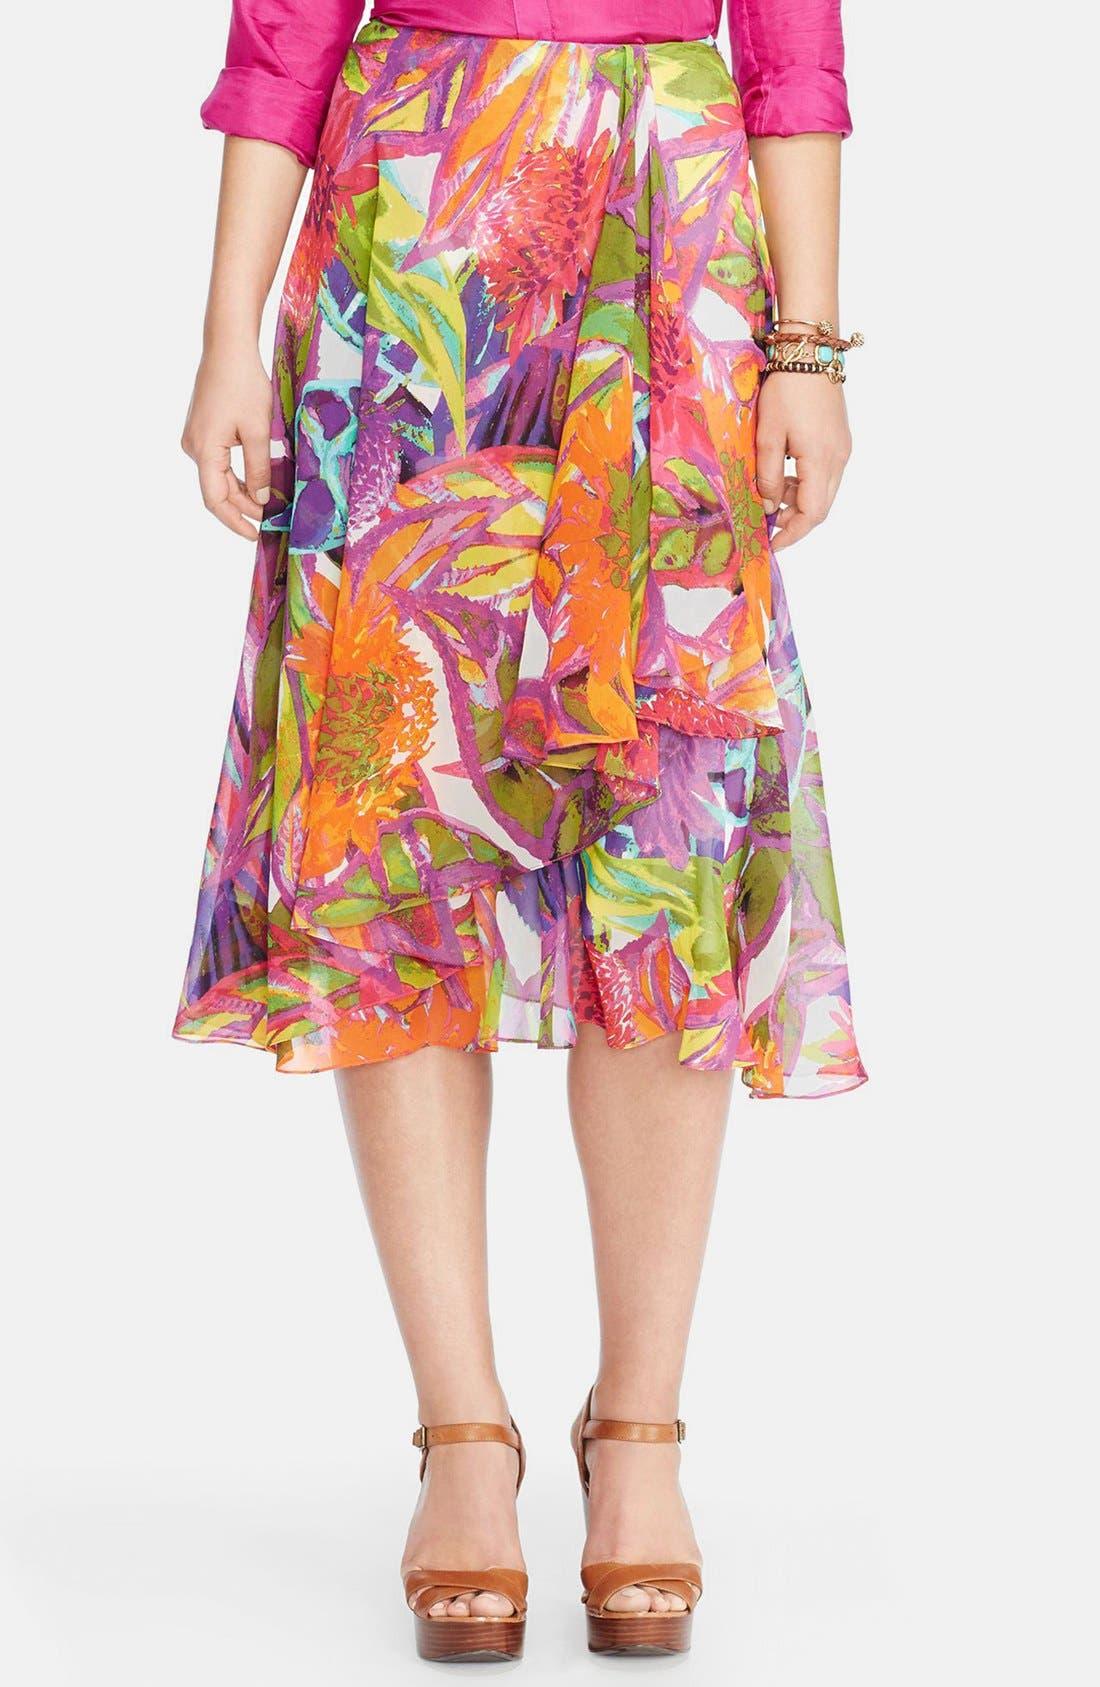 Alternate Image 1 Selected - Lauren Ralph Lauren Ruffled Floral Faux Wrap Skirt